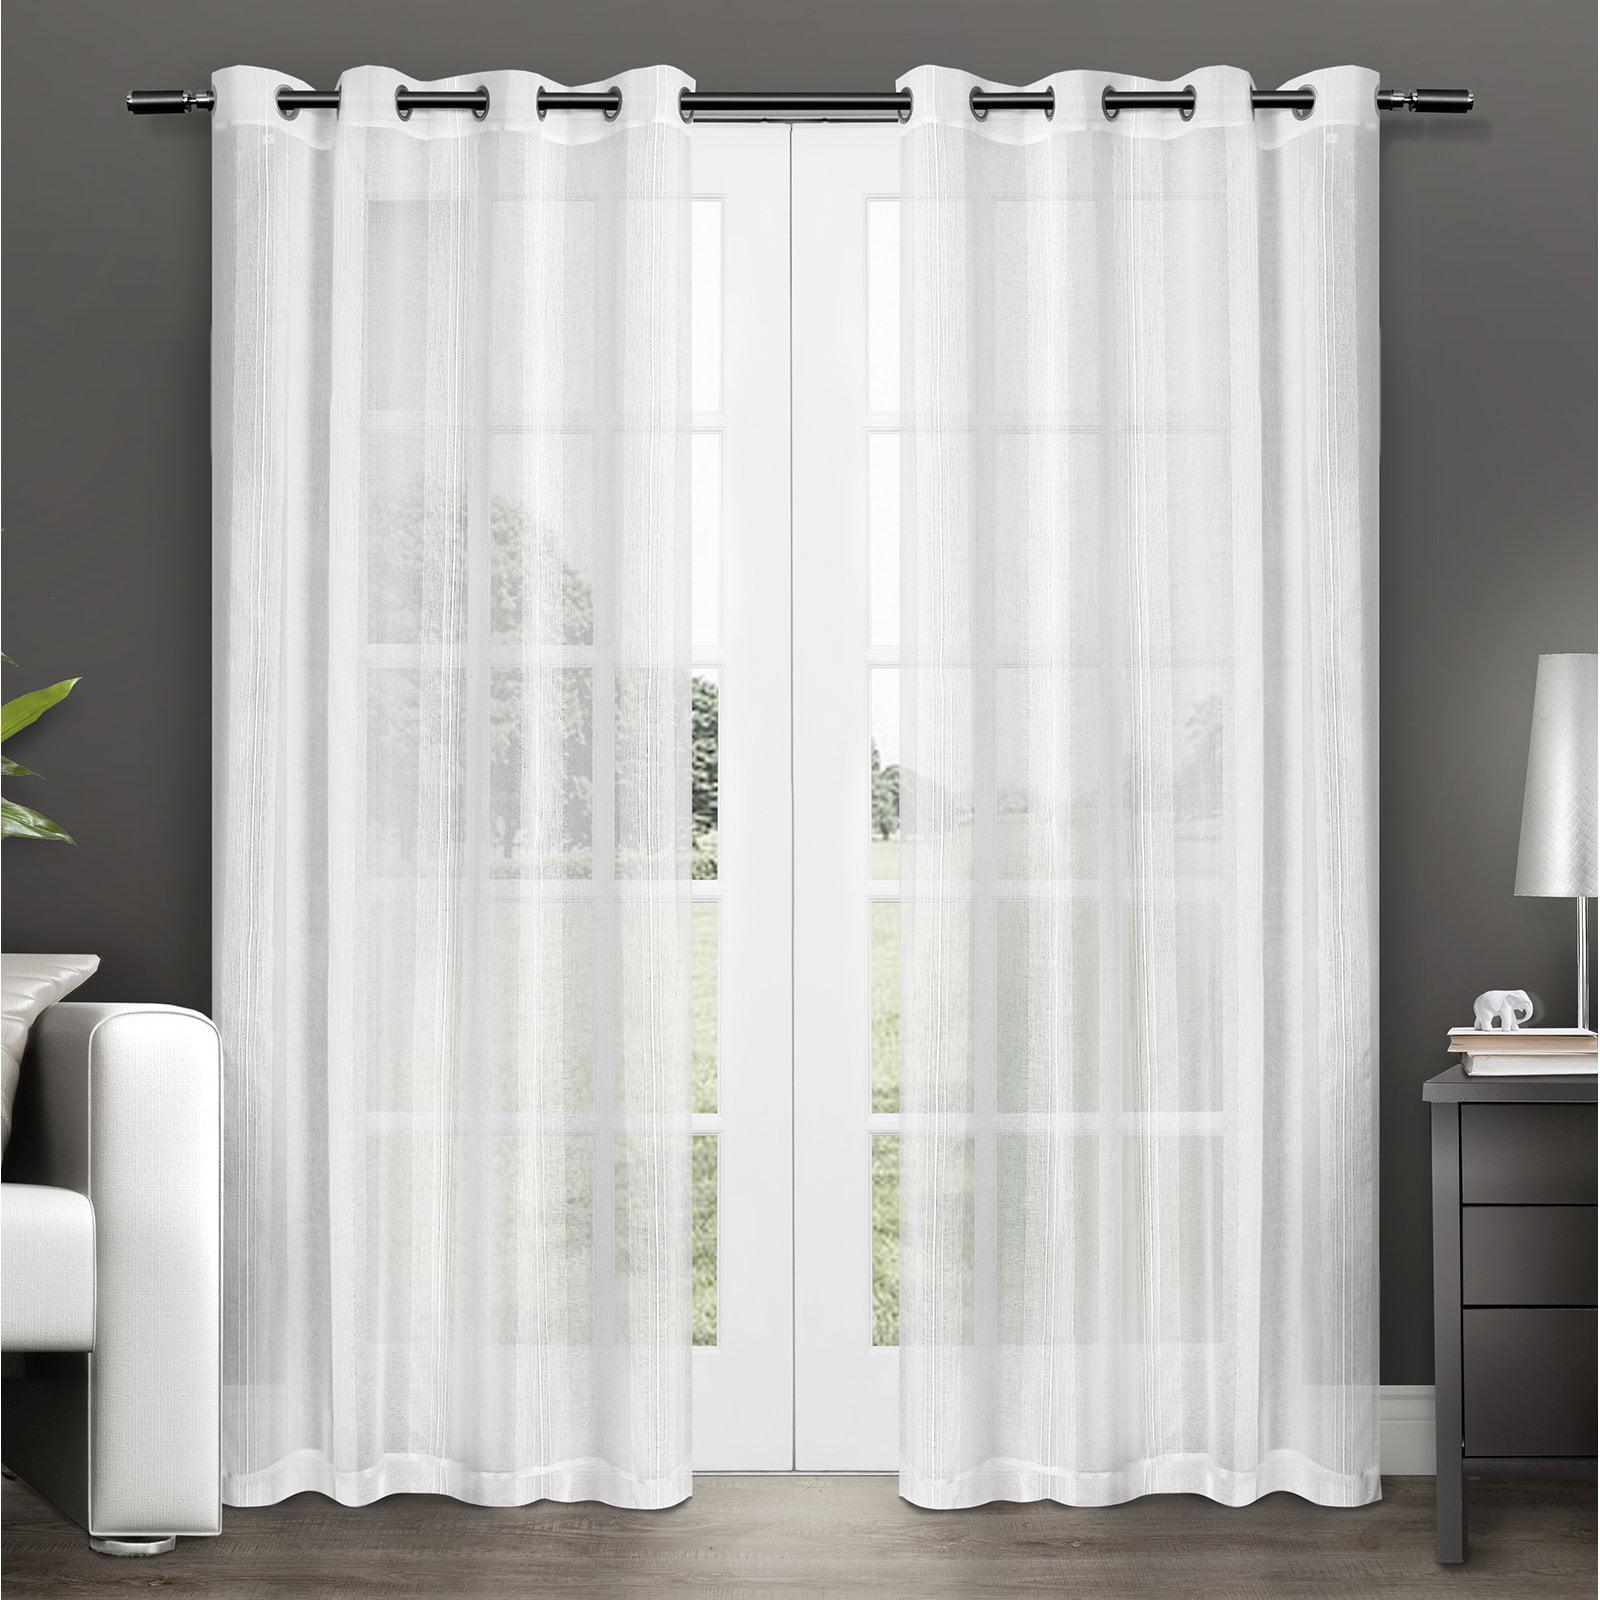 loading com curtains zoom window shimmer panel curtainworks grommet sheer ivory melrose curtain panels semi